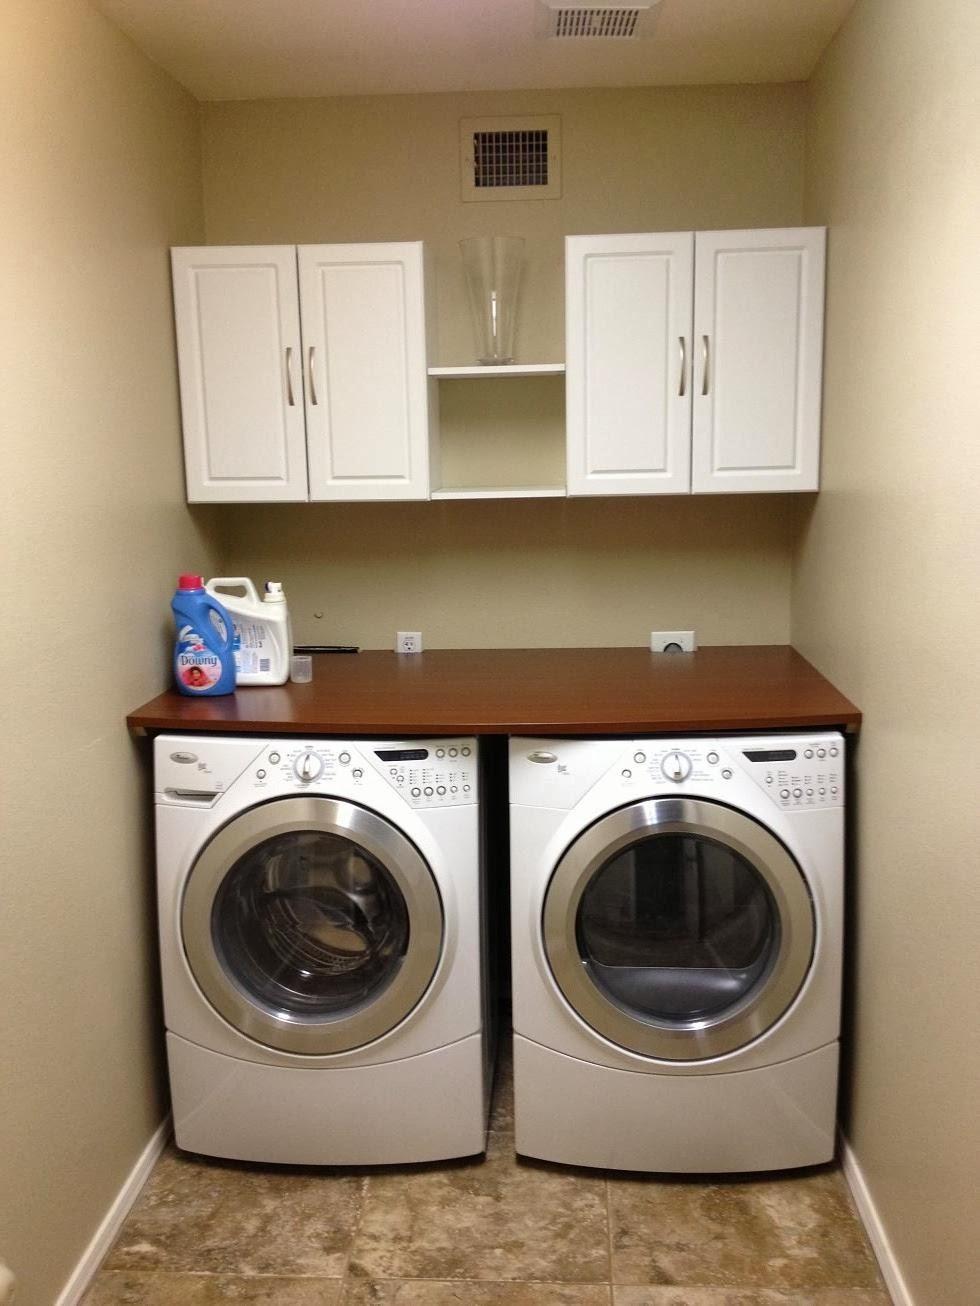 Hesselblogger: Laundry Room